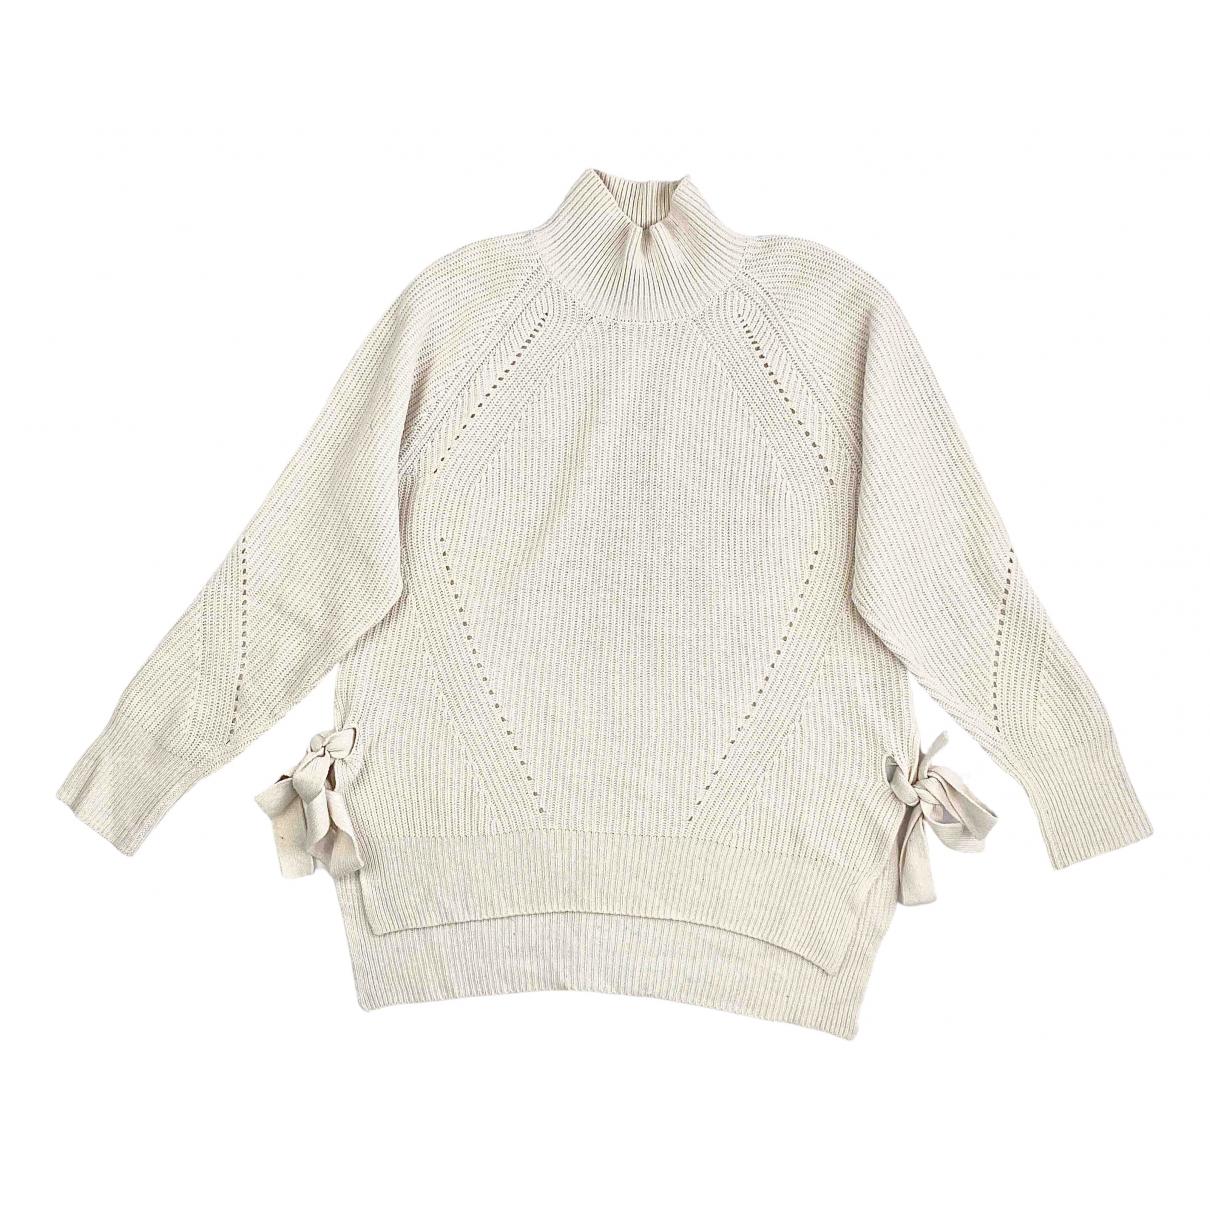 Rebecca Taylor N Ecru Cotton Knitwear for Women M International